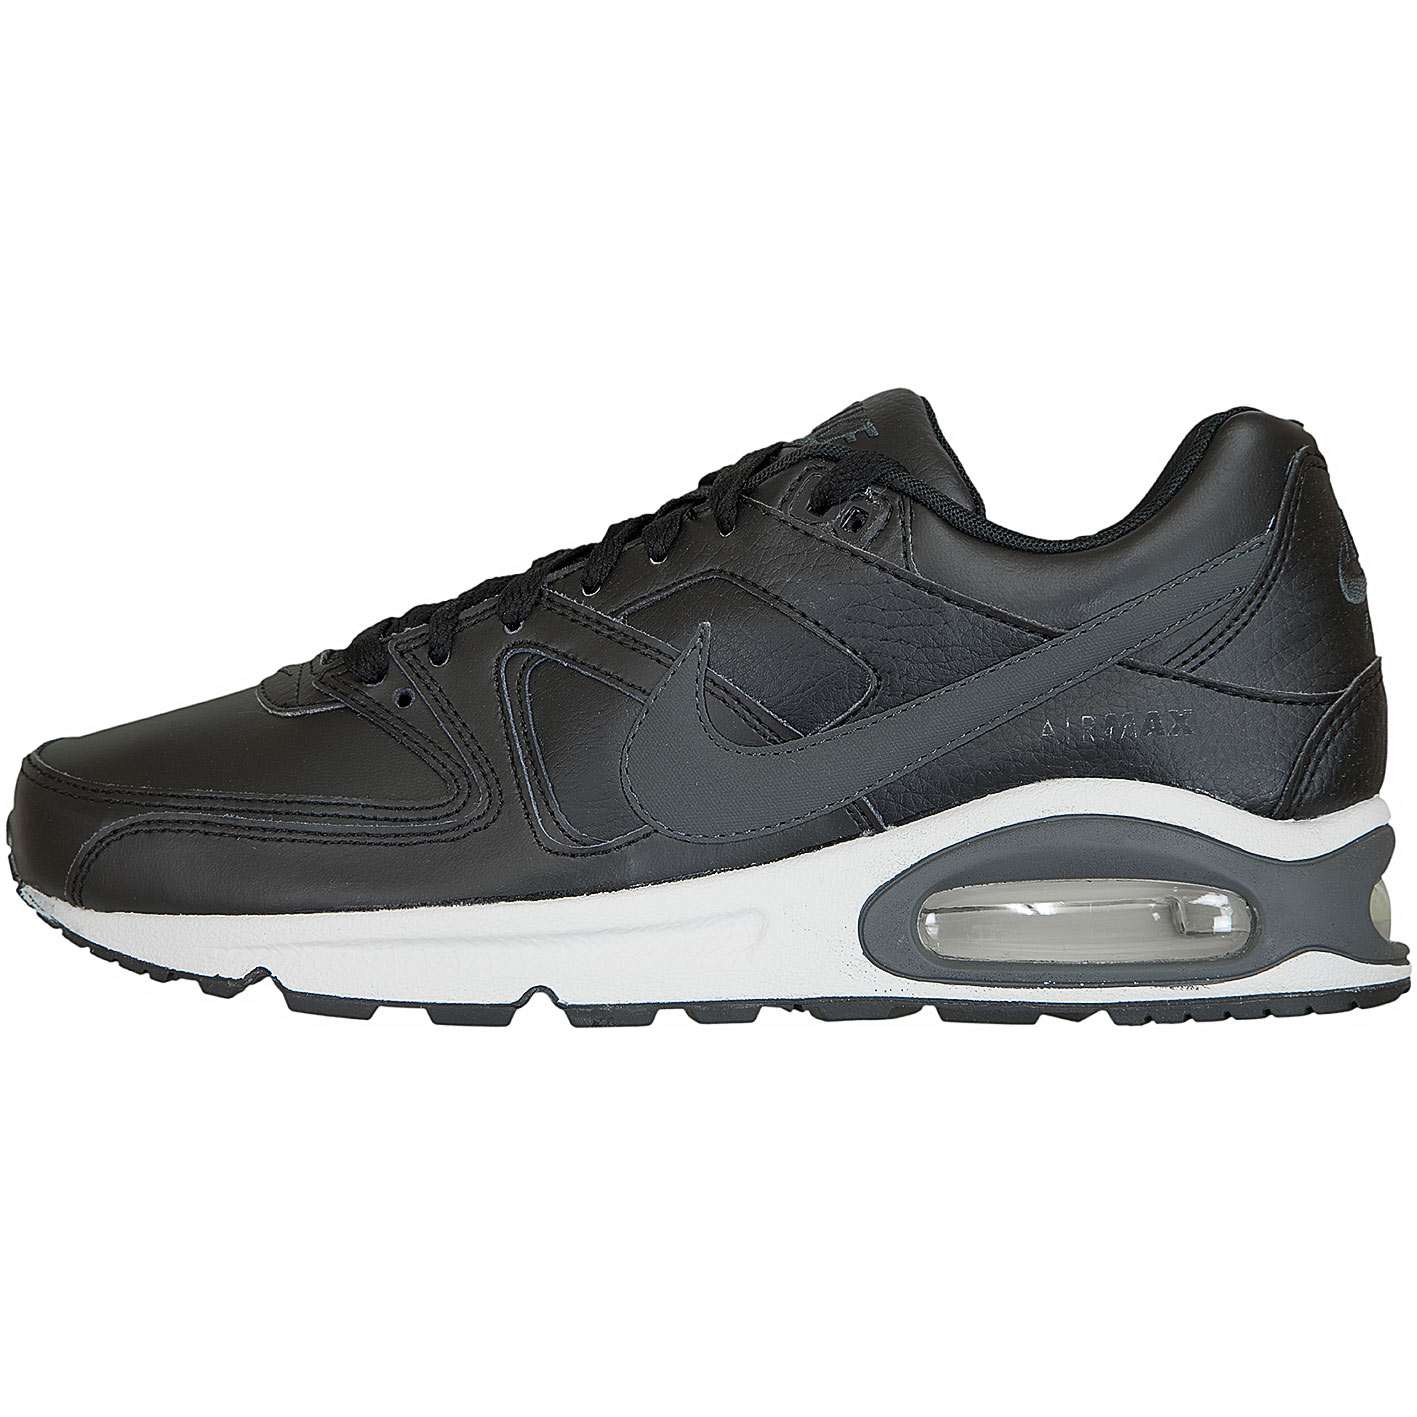 Nike Air Max Command Leather Schwarz Weiß aktion